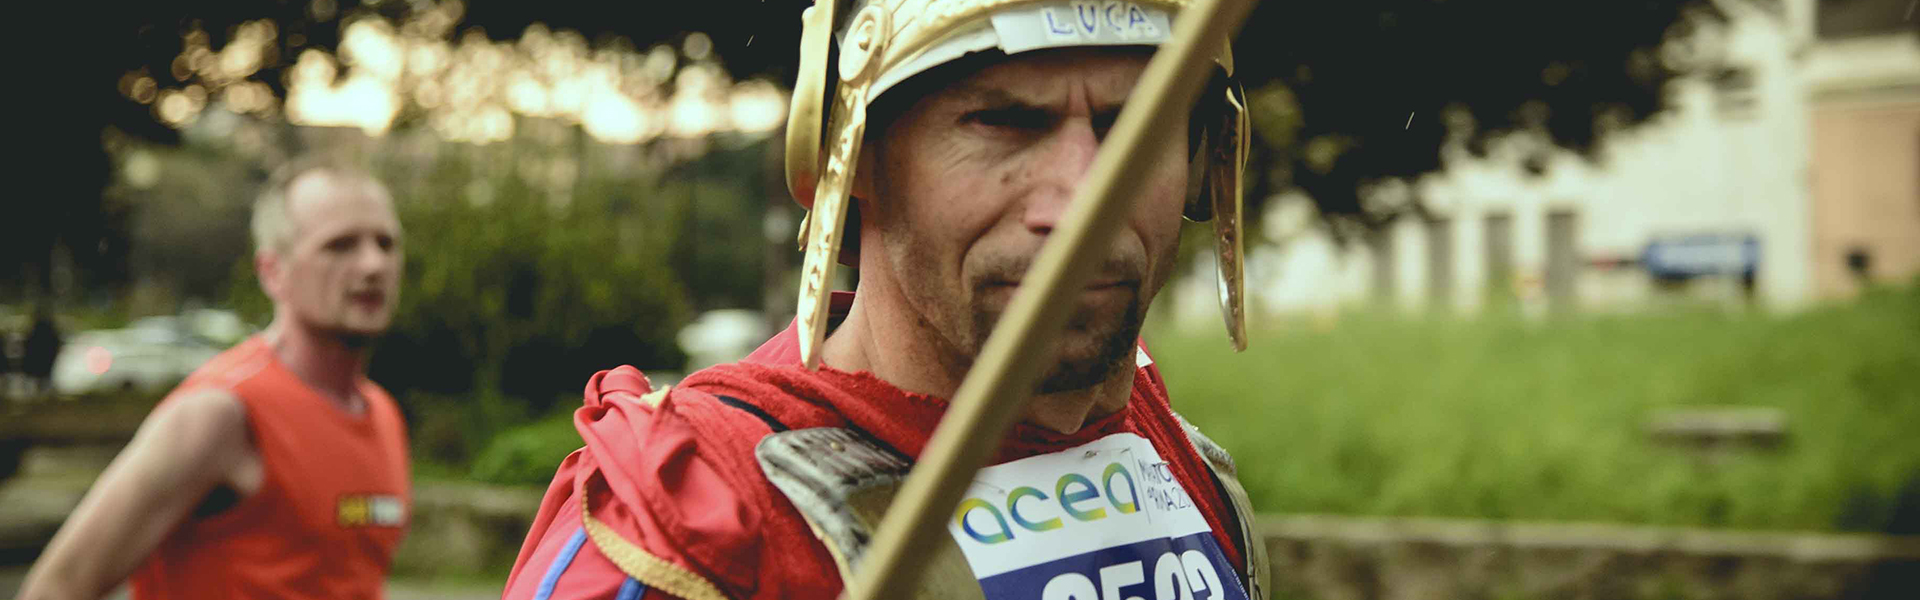 10 reasons to run Acea Run Rome the Marathon